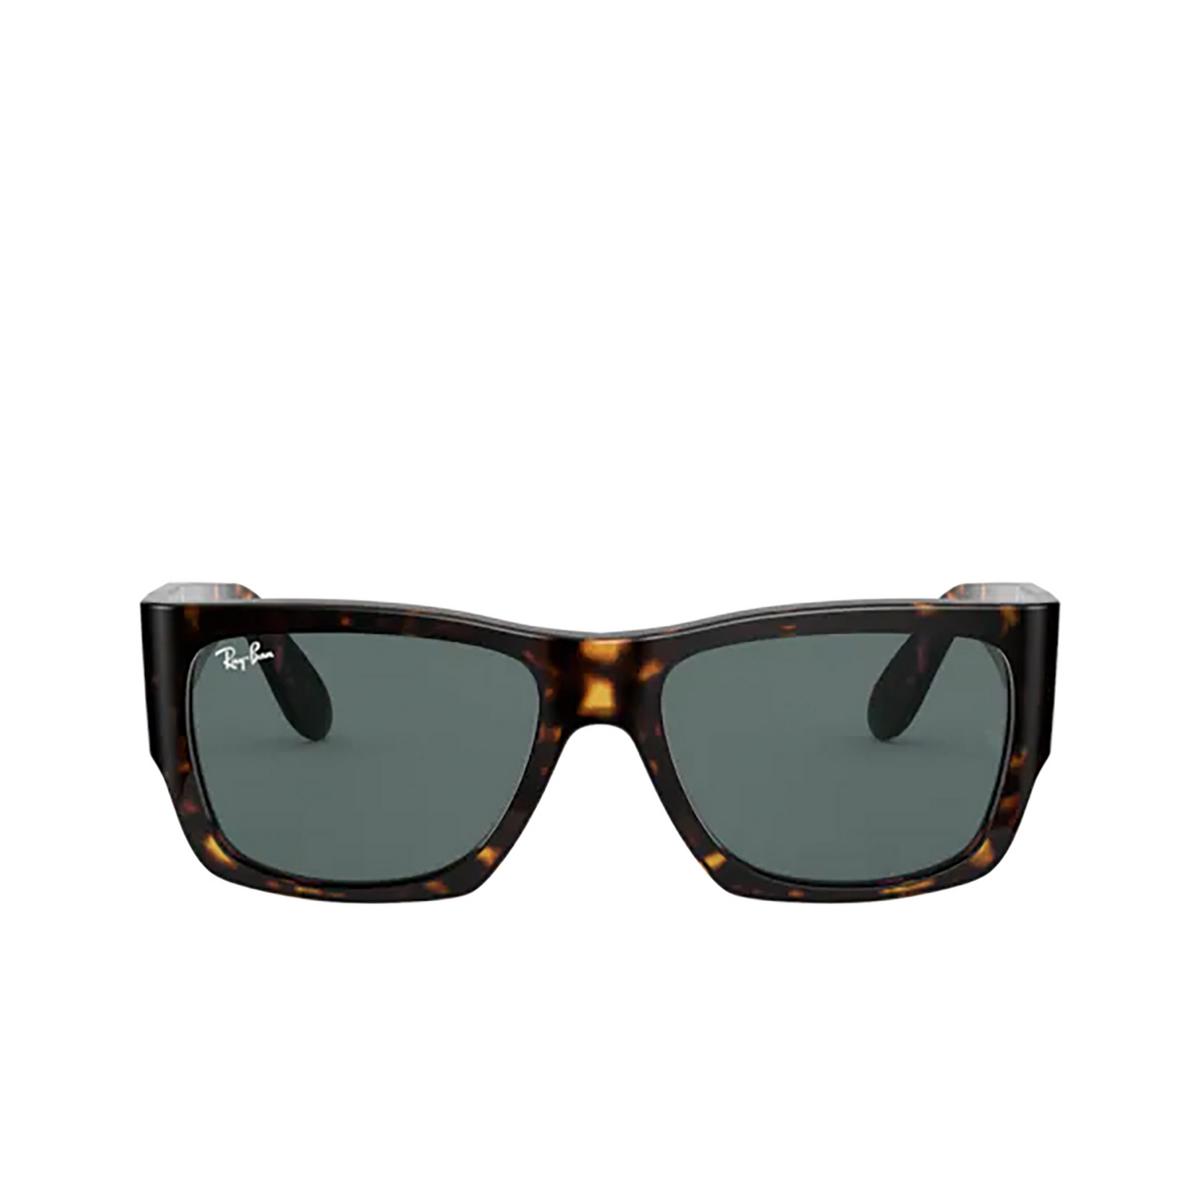 Ray-Ban® Square Sunglasses: Wayfarer Nomad RB2187 color Tortoise 902/R5 - 1/3.